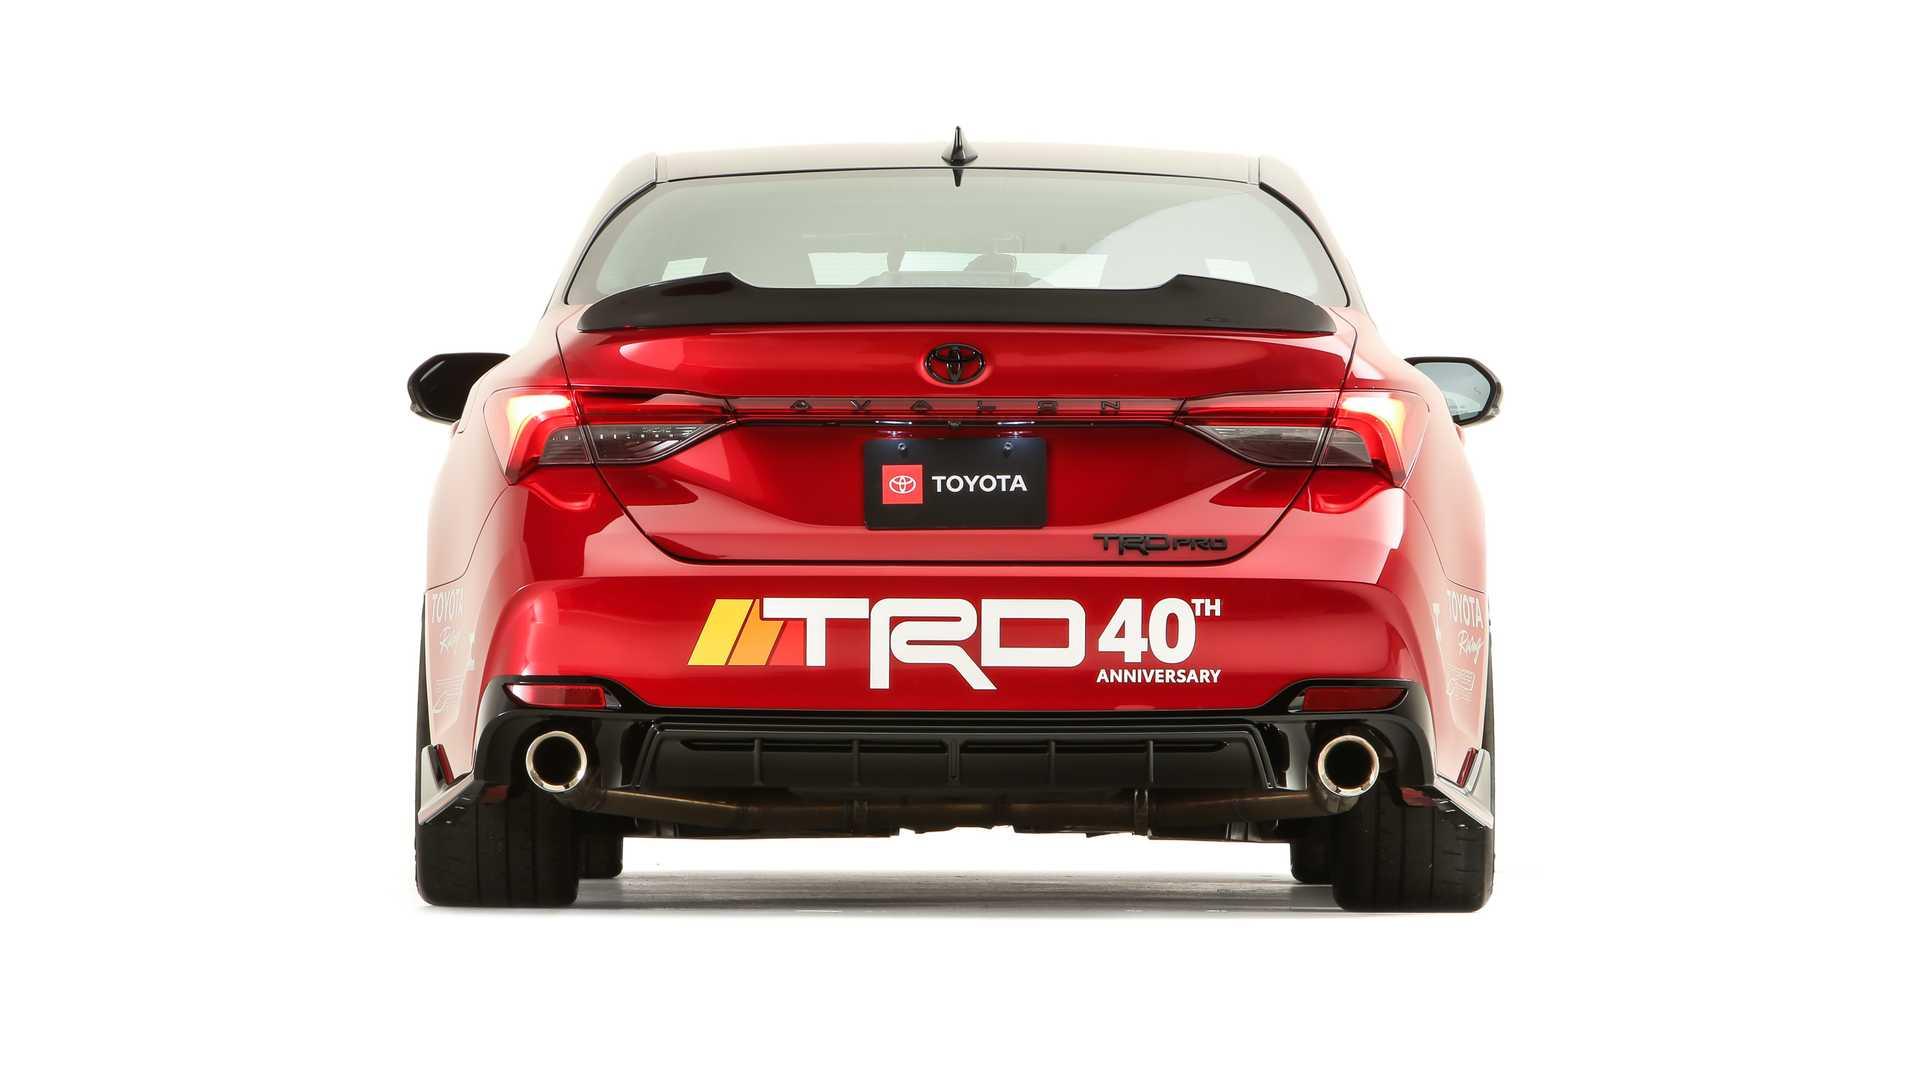 Яркий юбилейный тюнинг Toyota Avalon от TRD